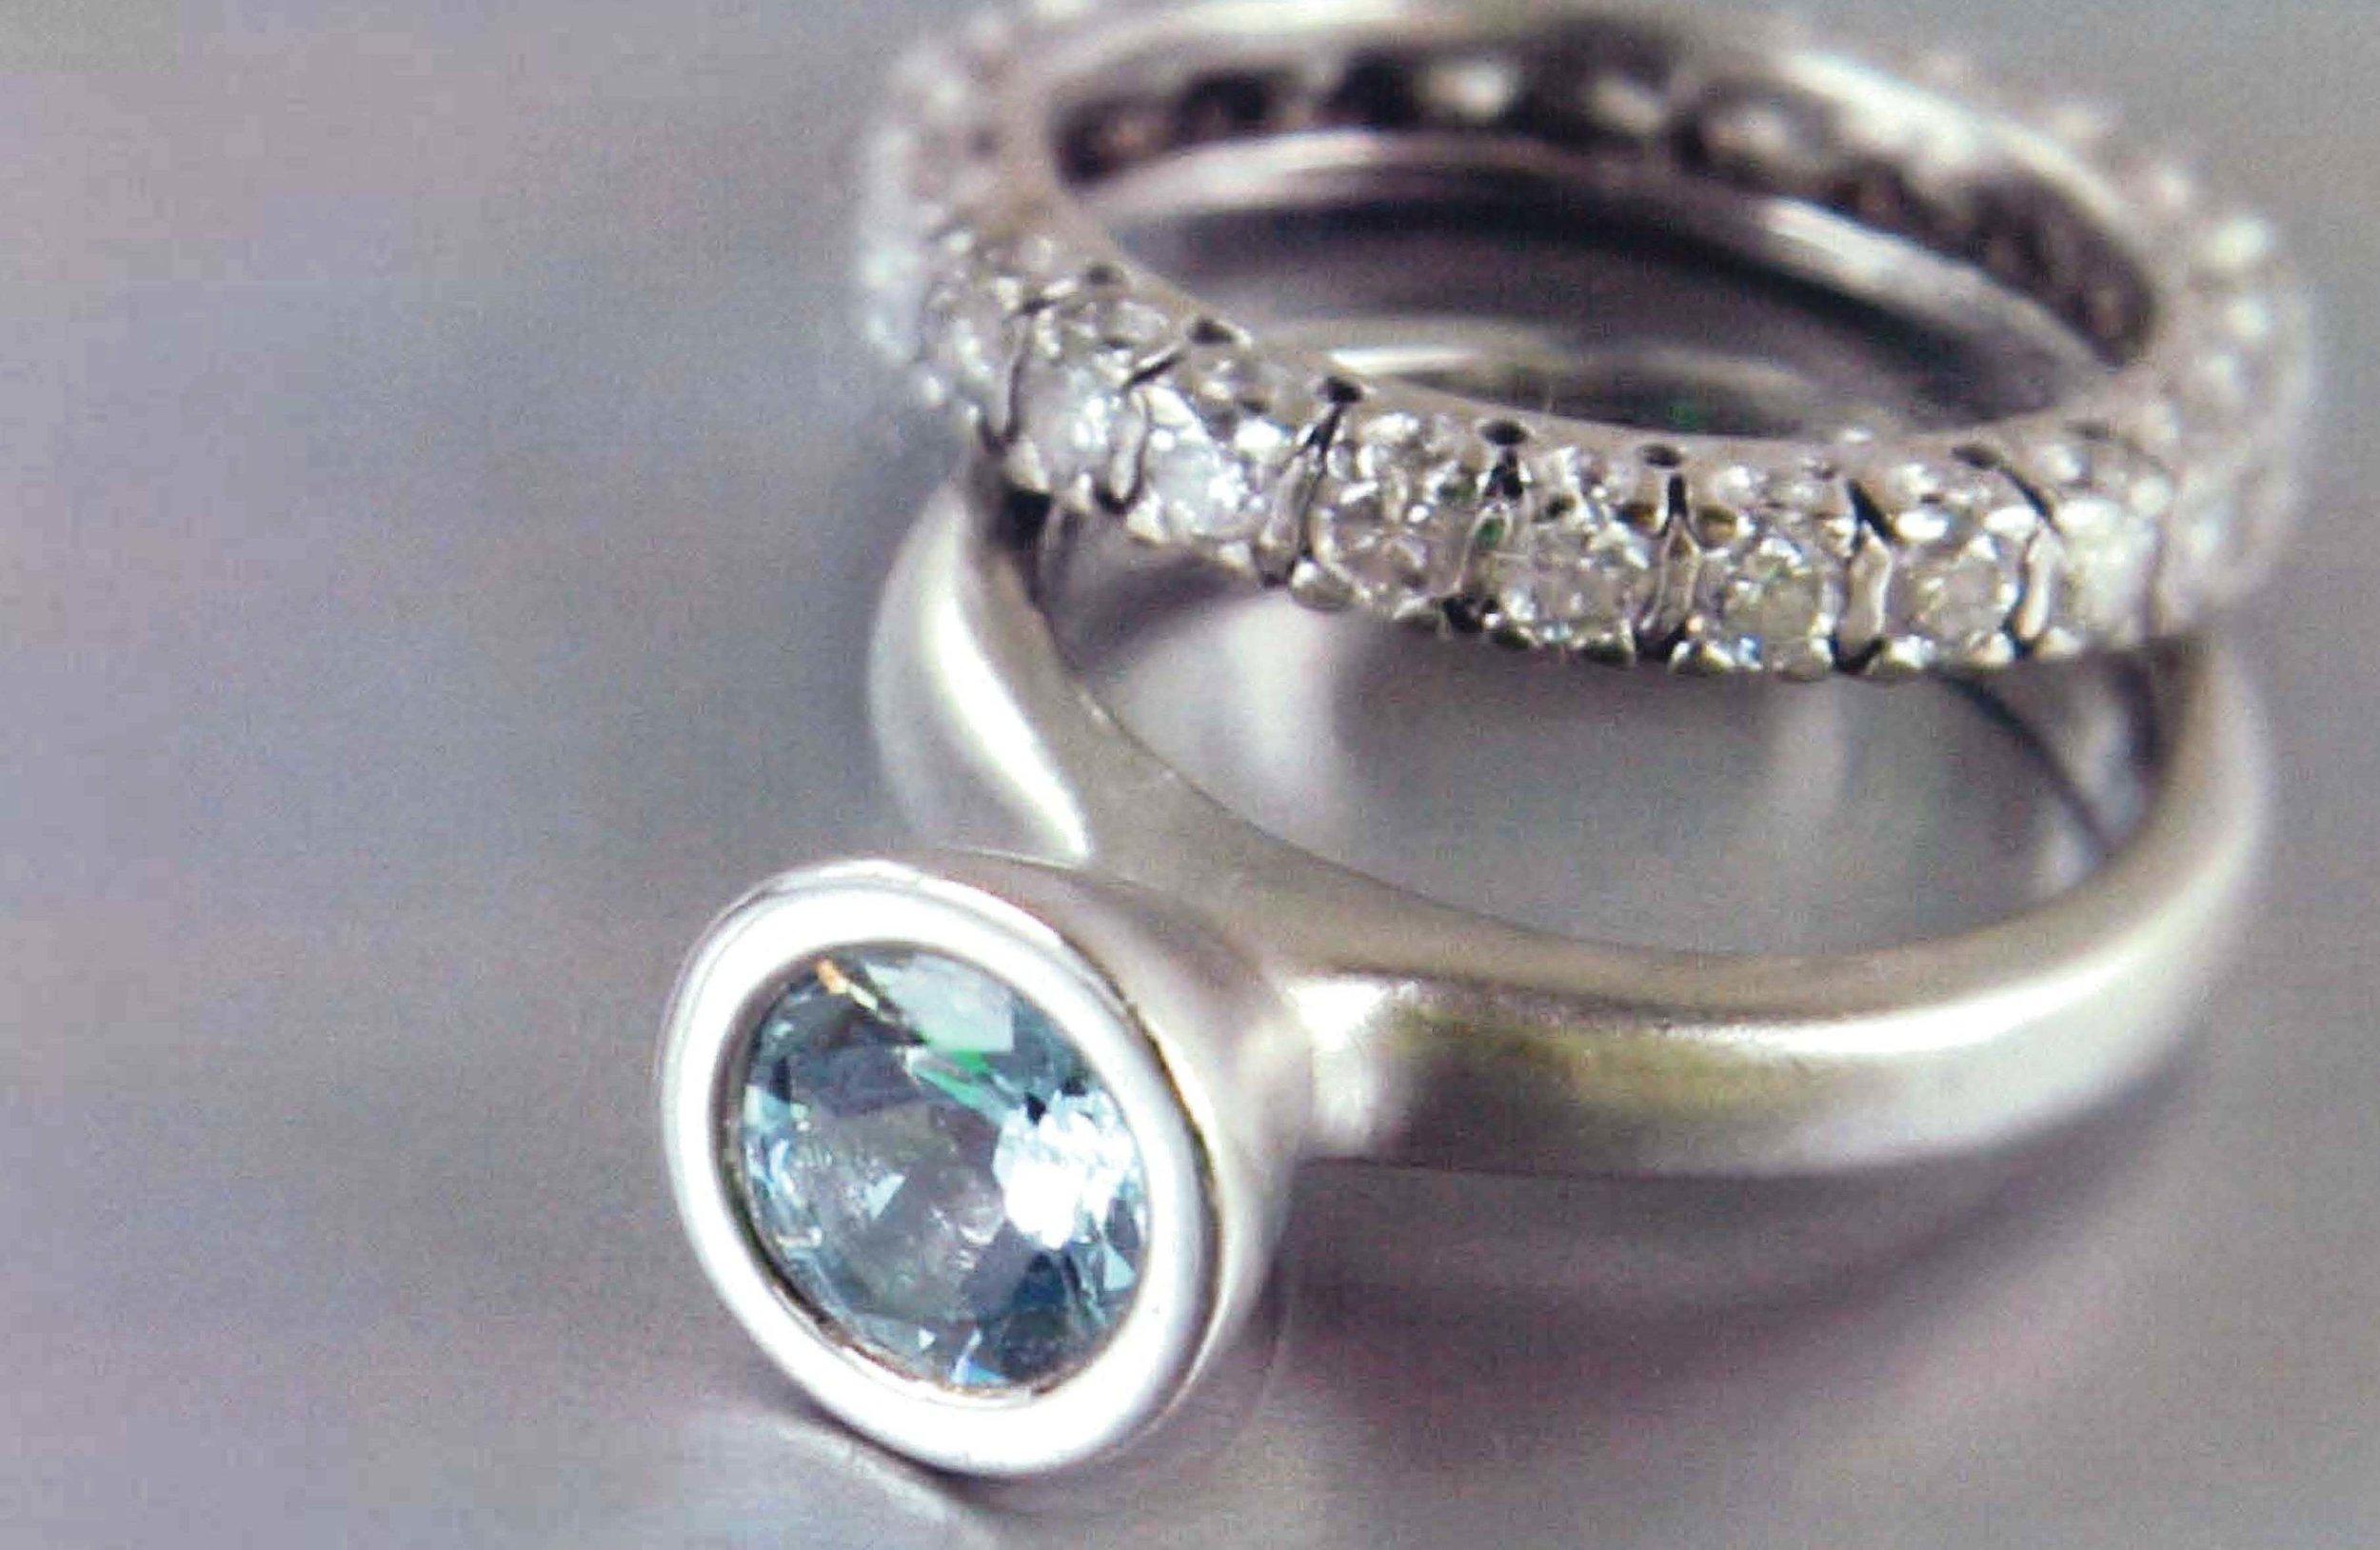 18kt White Gold Eternity Band, Platinum Ring with Aquamarine